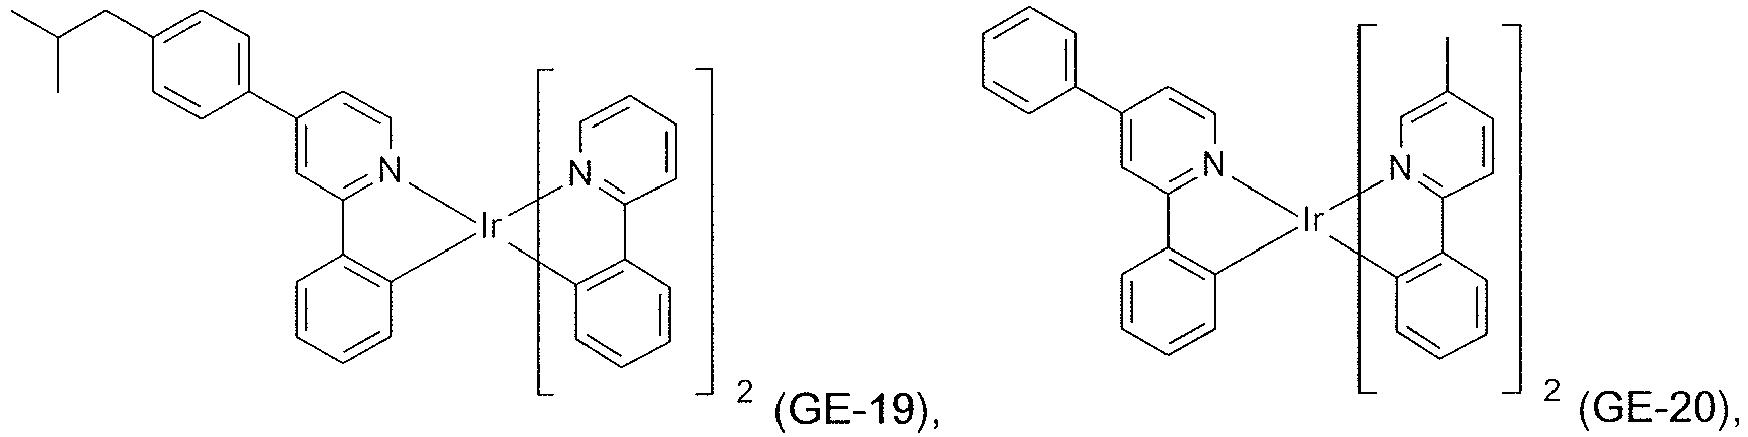 Figure imgb0658